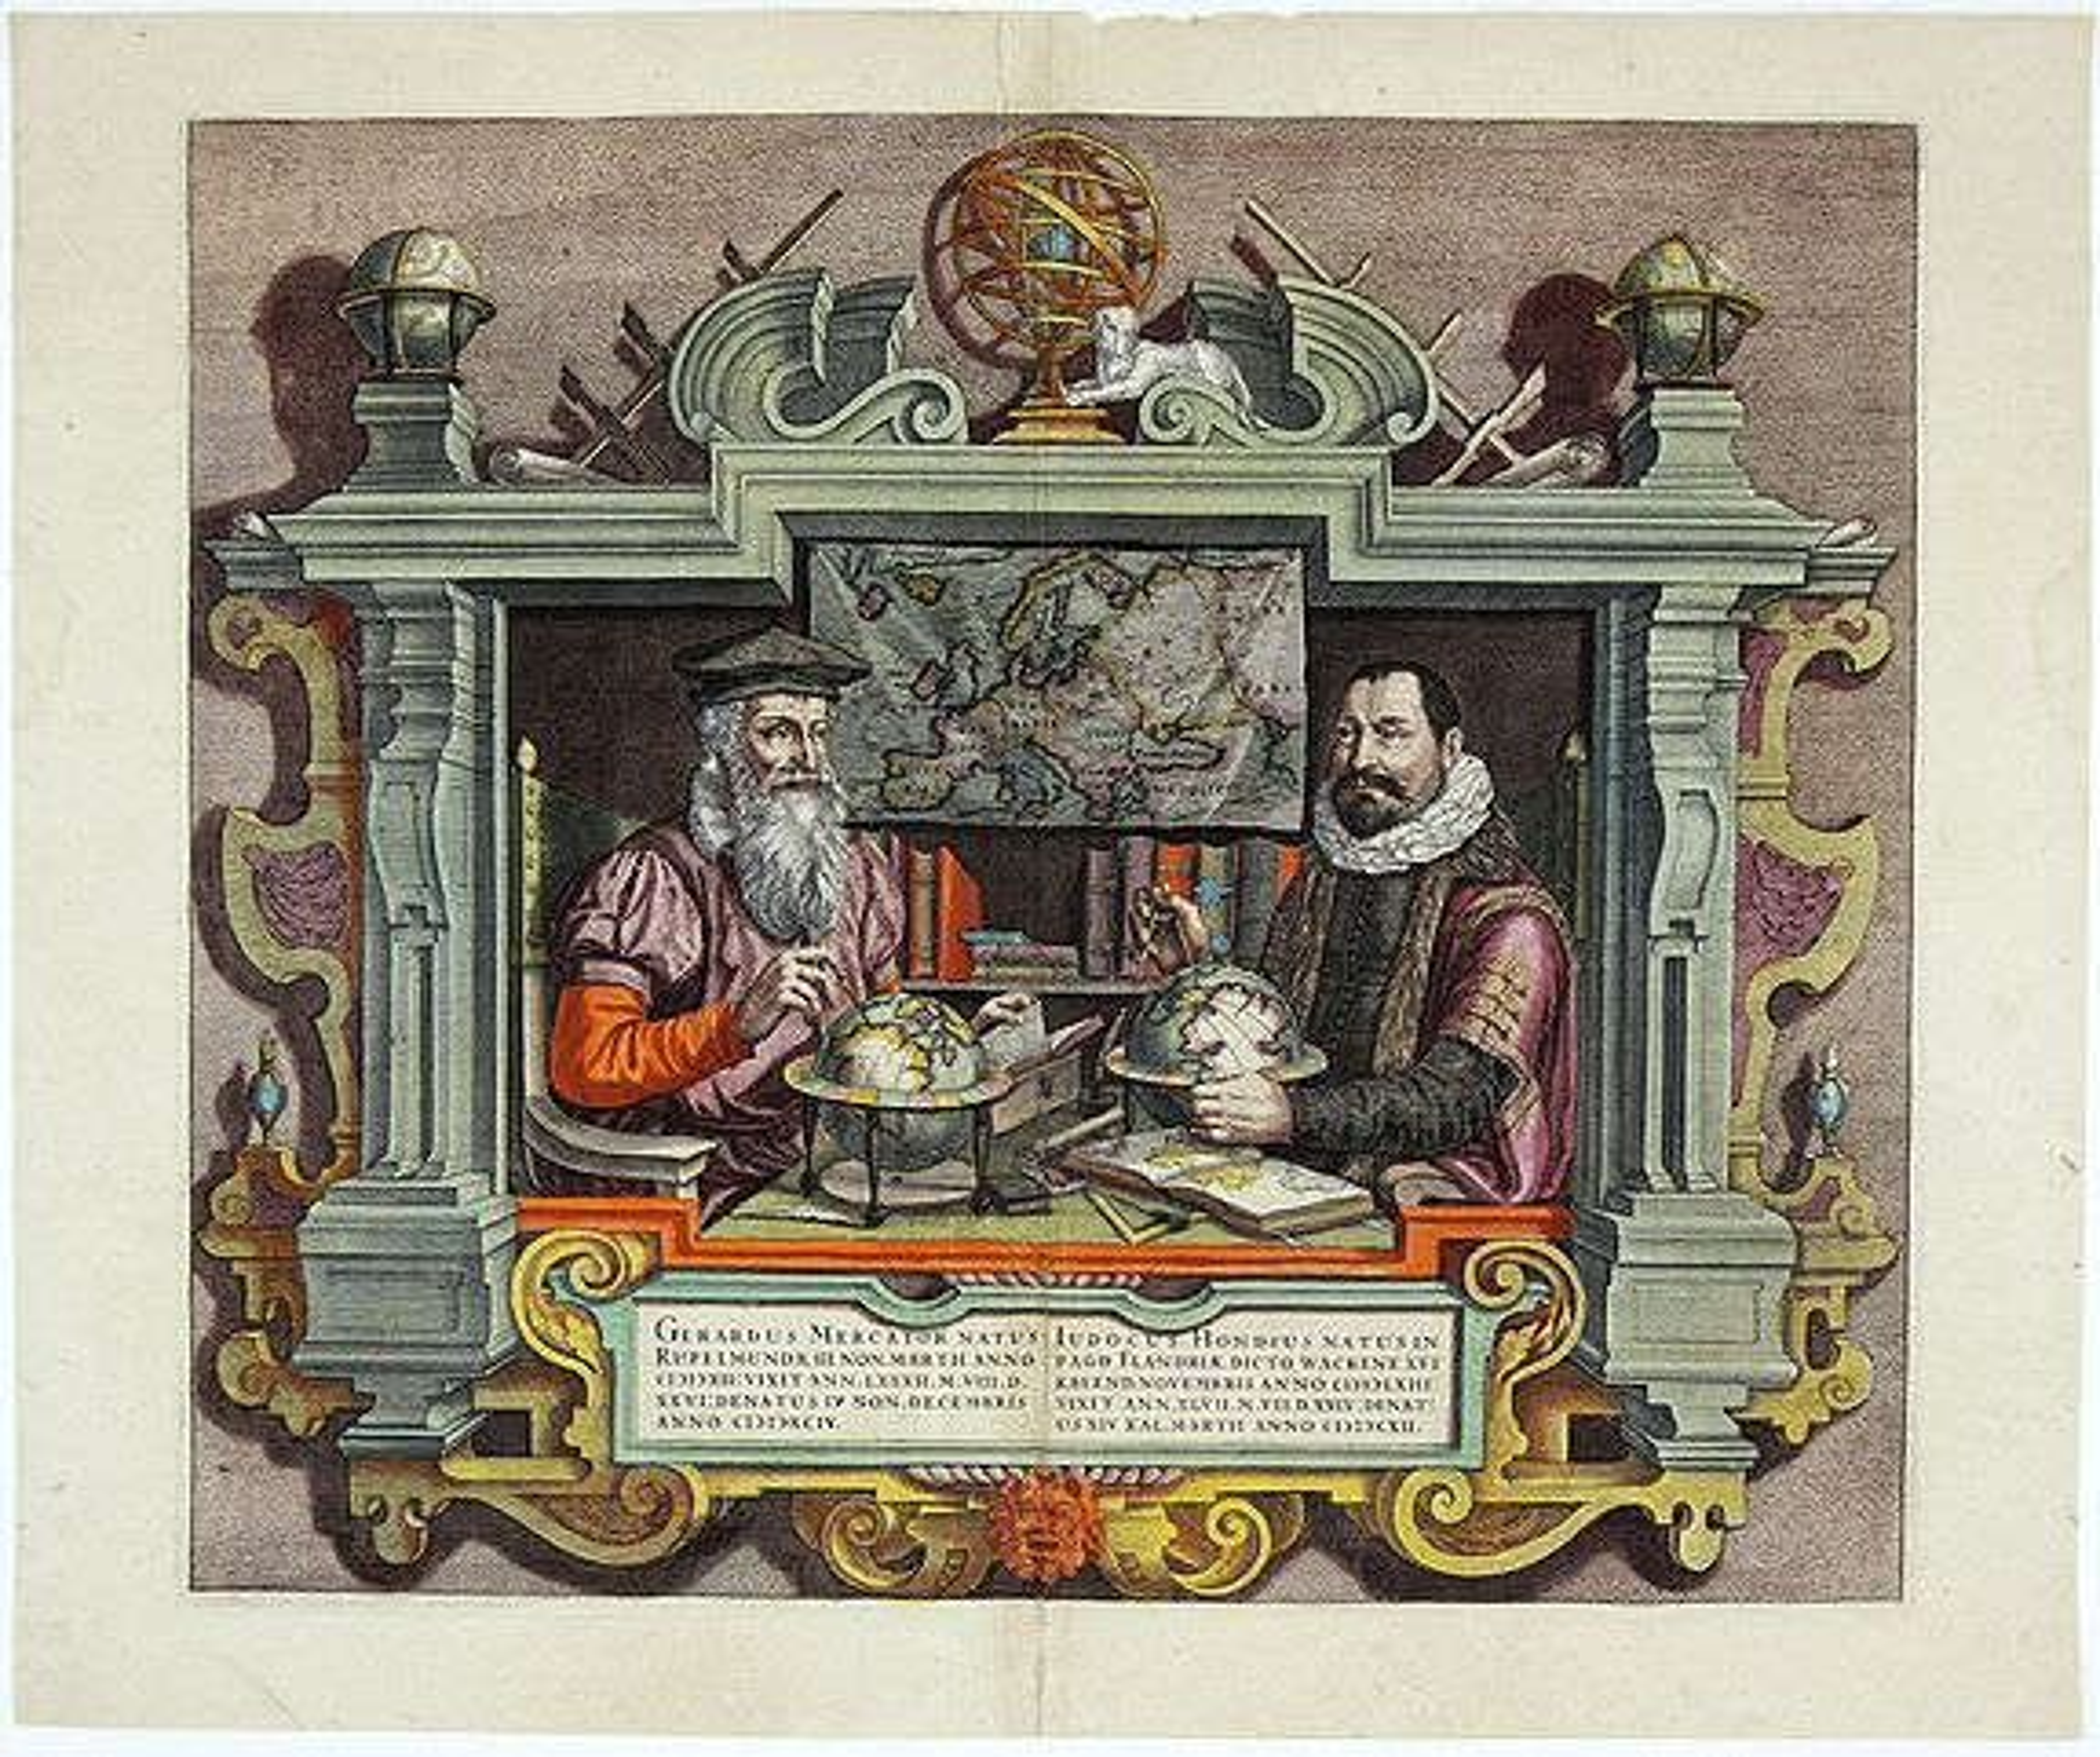 MERCATOR,G./ HONDIUS,J. - [Title page] Gerardus Mercator Natus Rupelmundae III Non. Mart II Anno CICICXII..